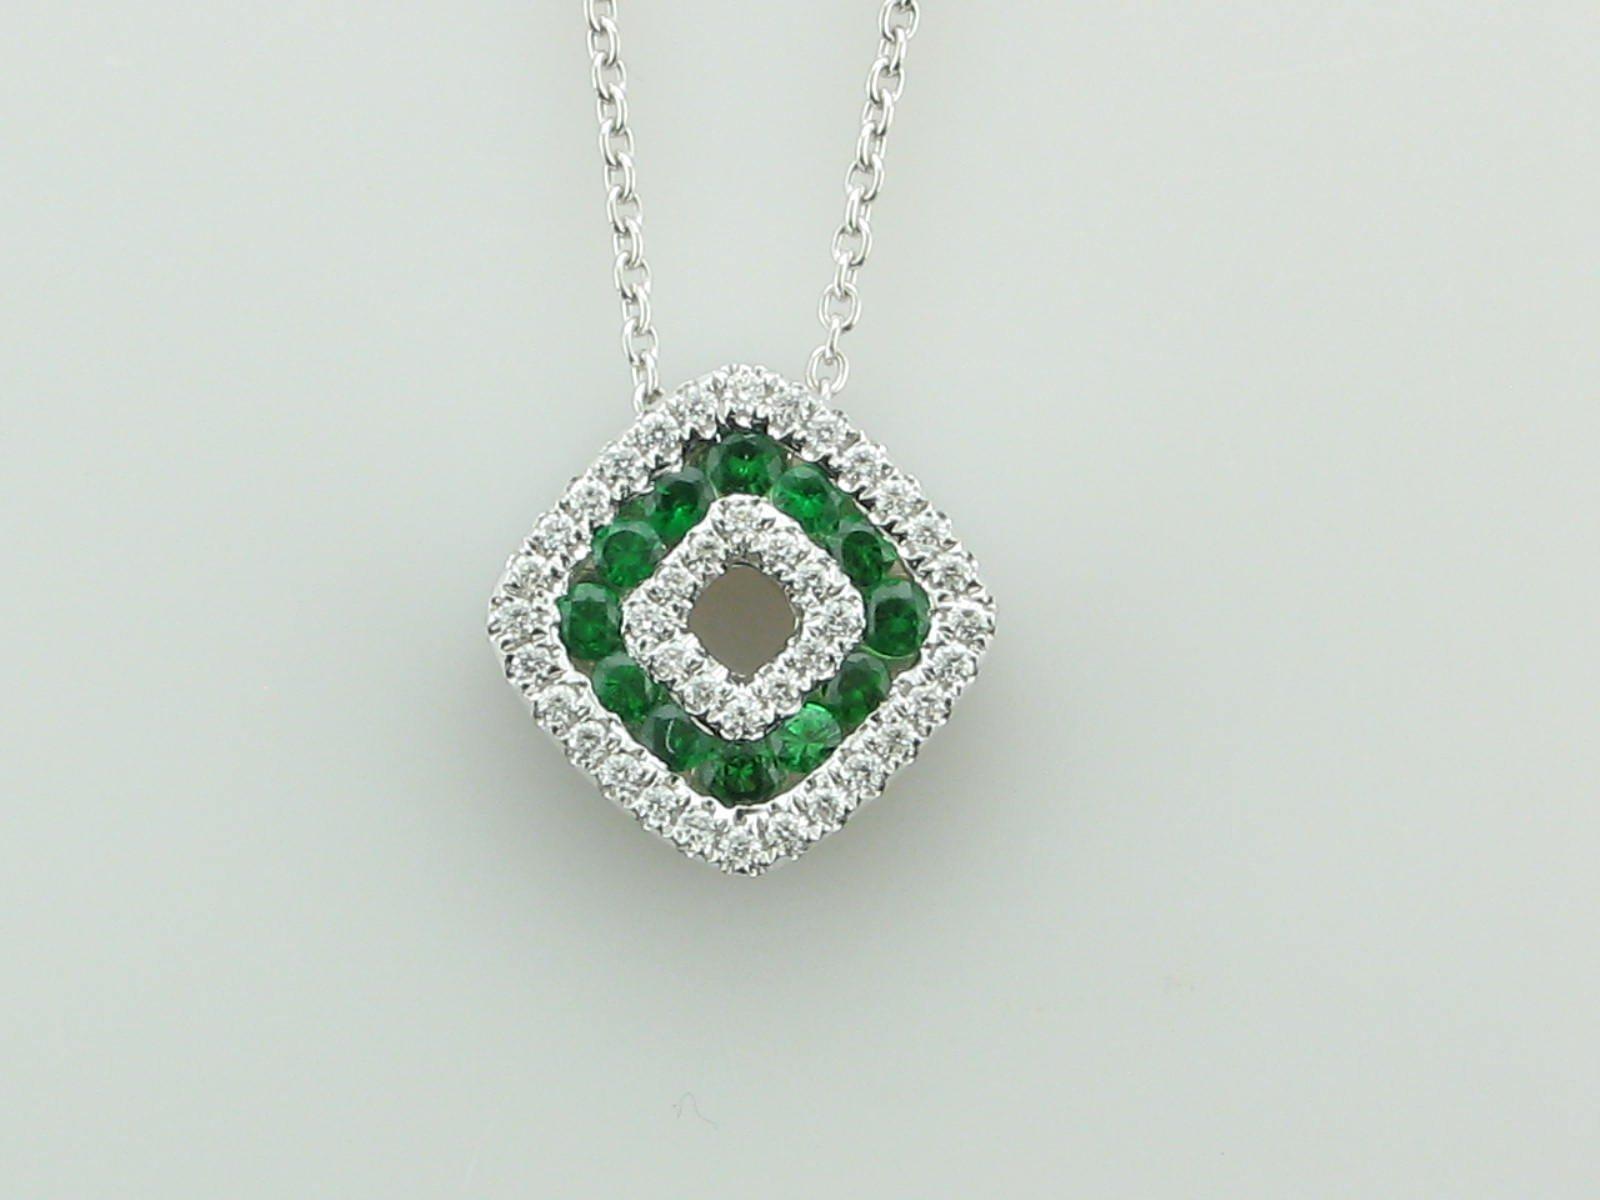 14K White Gold Diamond & Emerald Diamond Shaped Necklace - copy